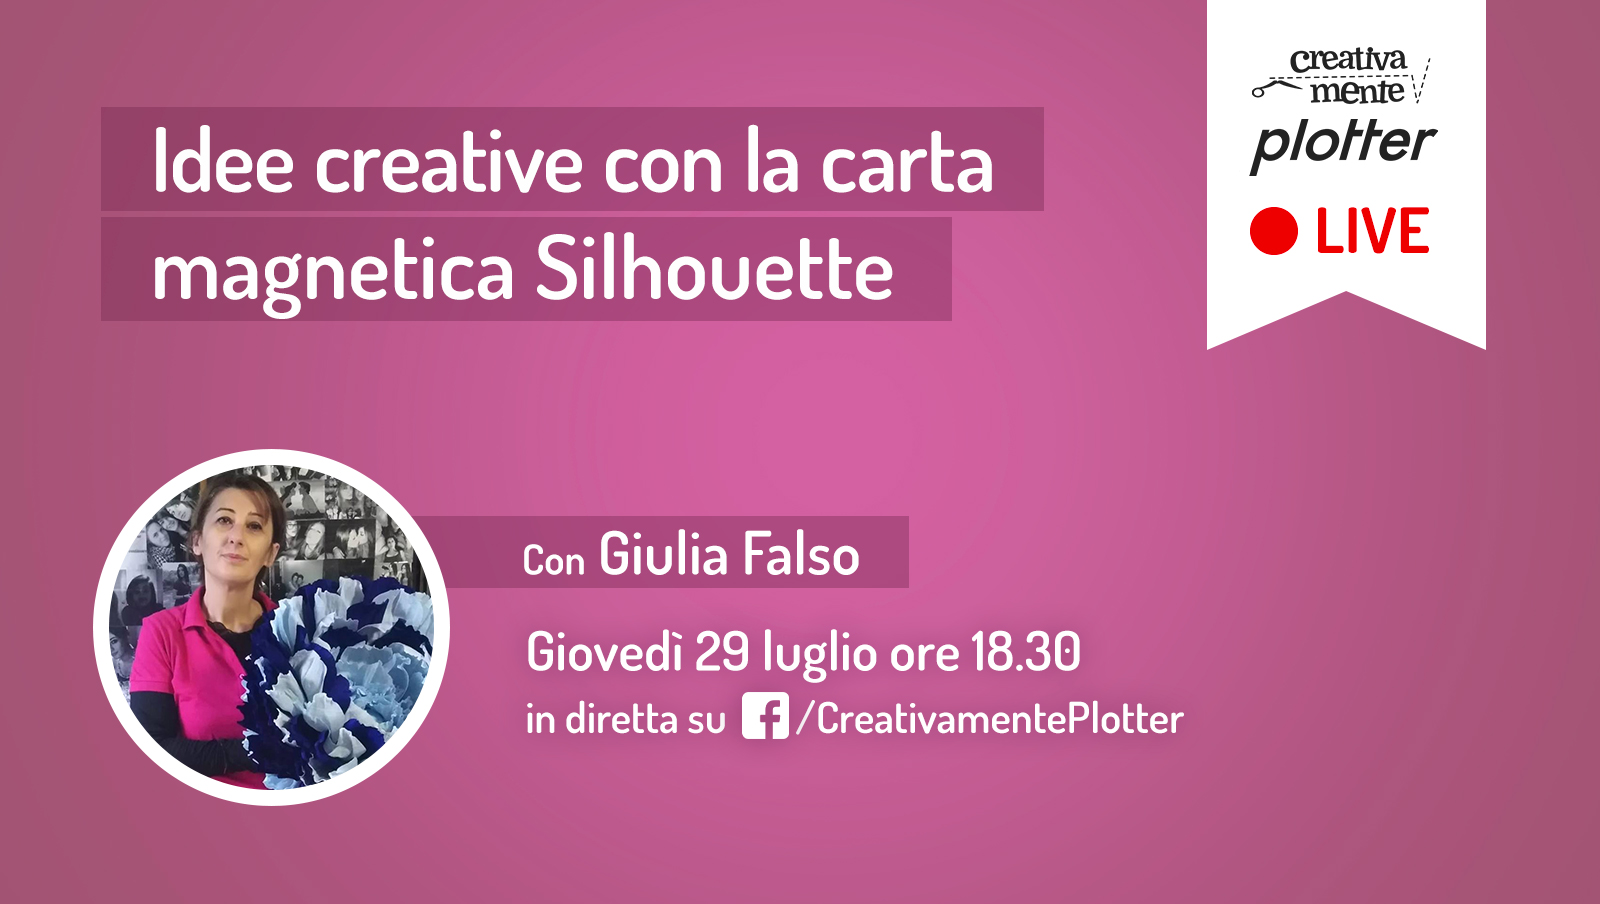 Diretta-Giulia-carta magnetica creativamente plotter